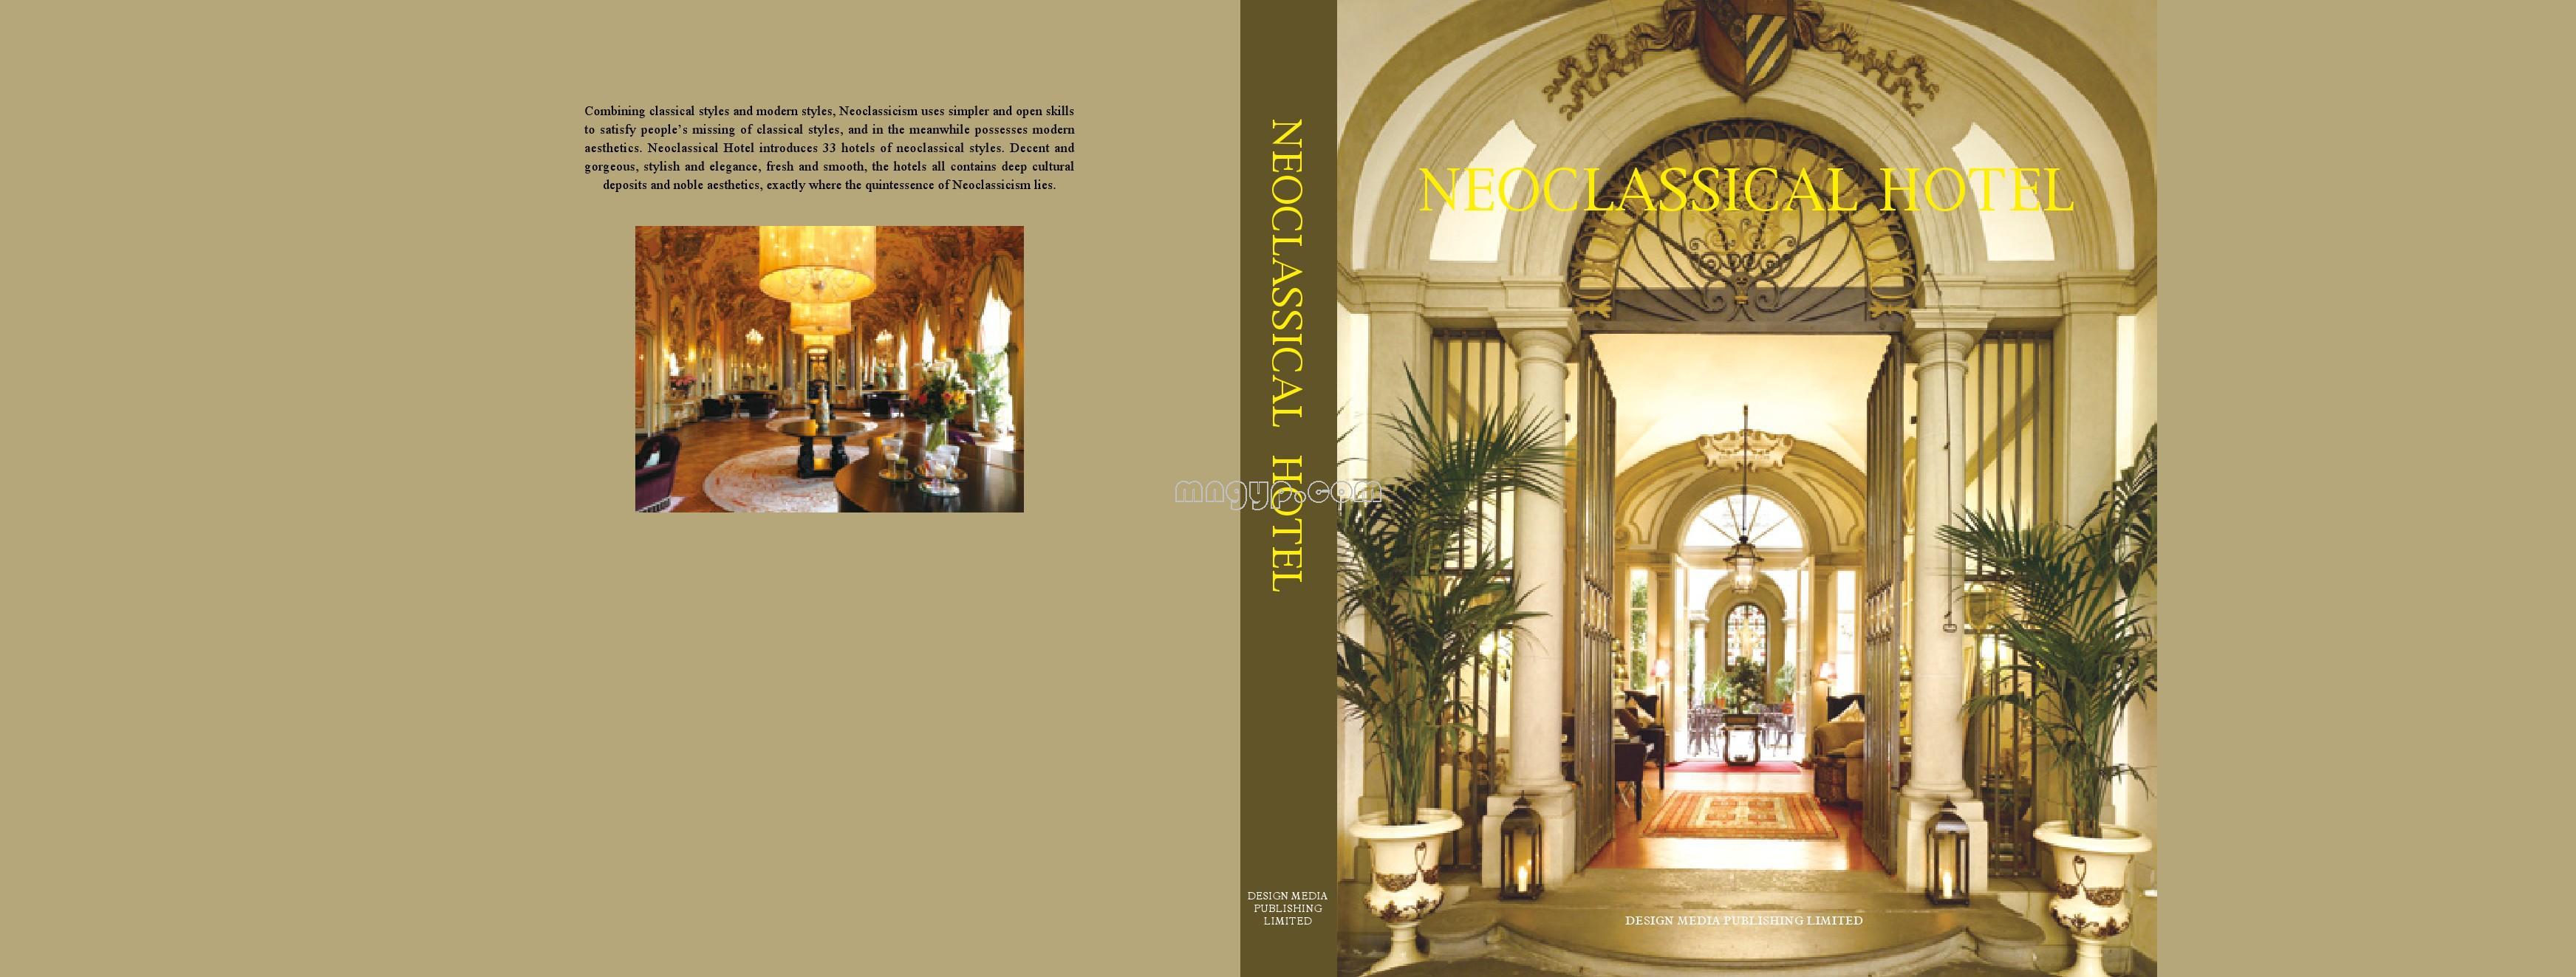 Neoclassical Hotel  Lighting